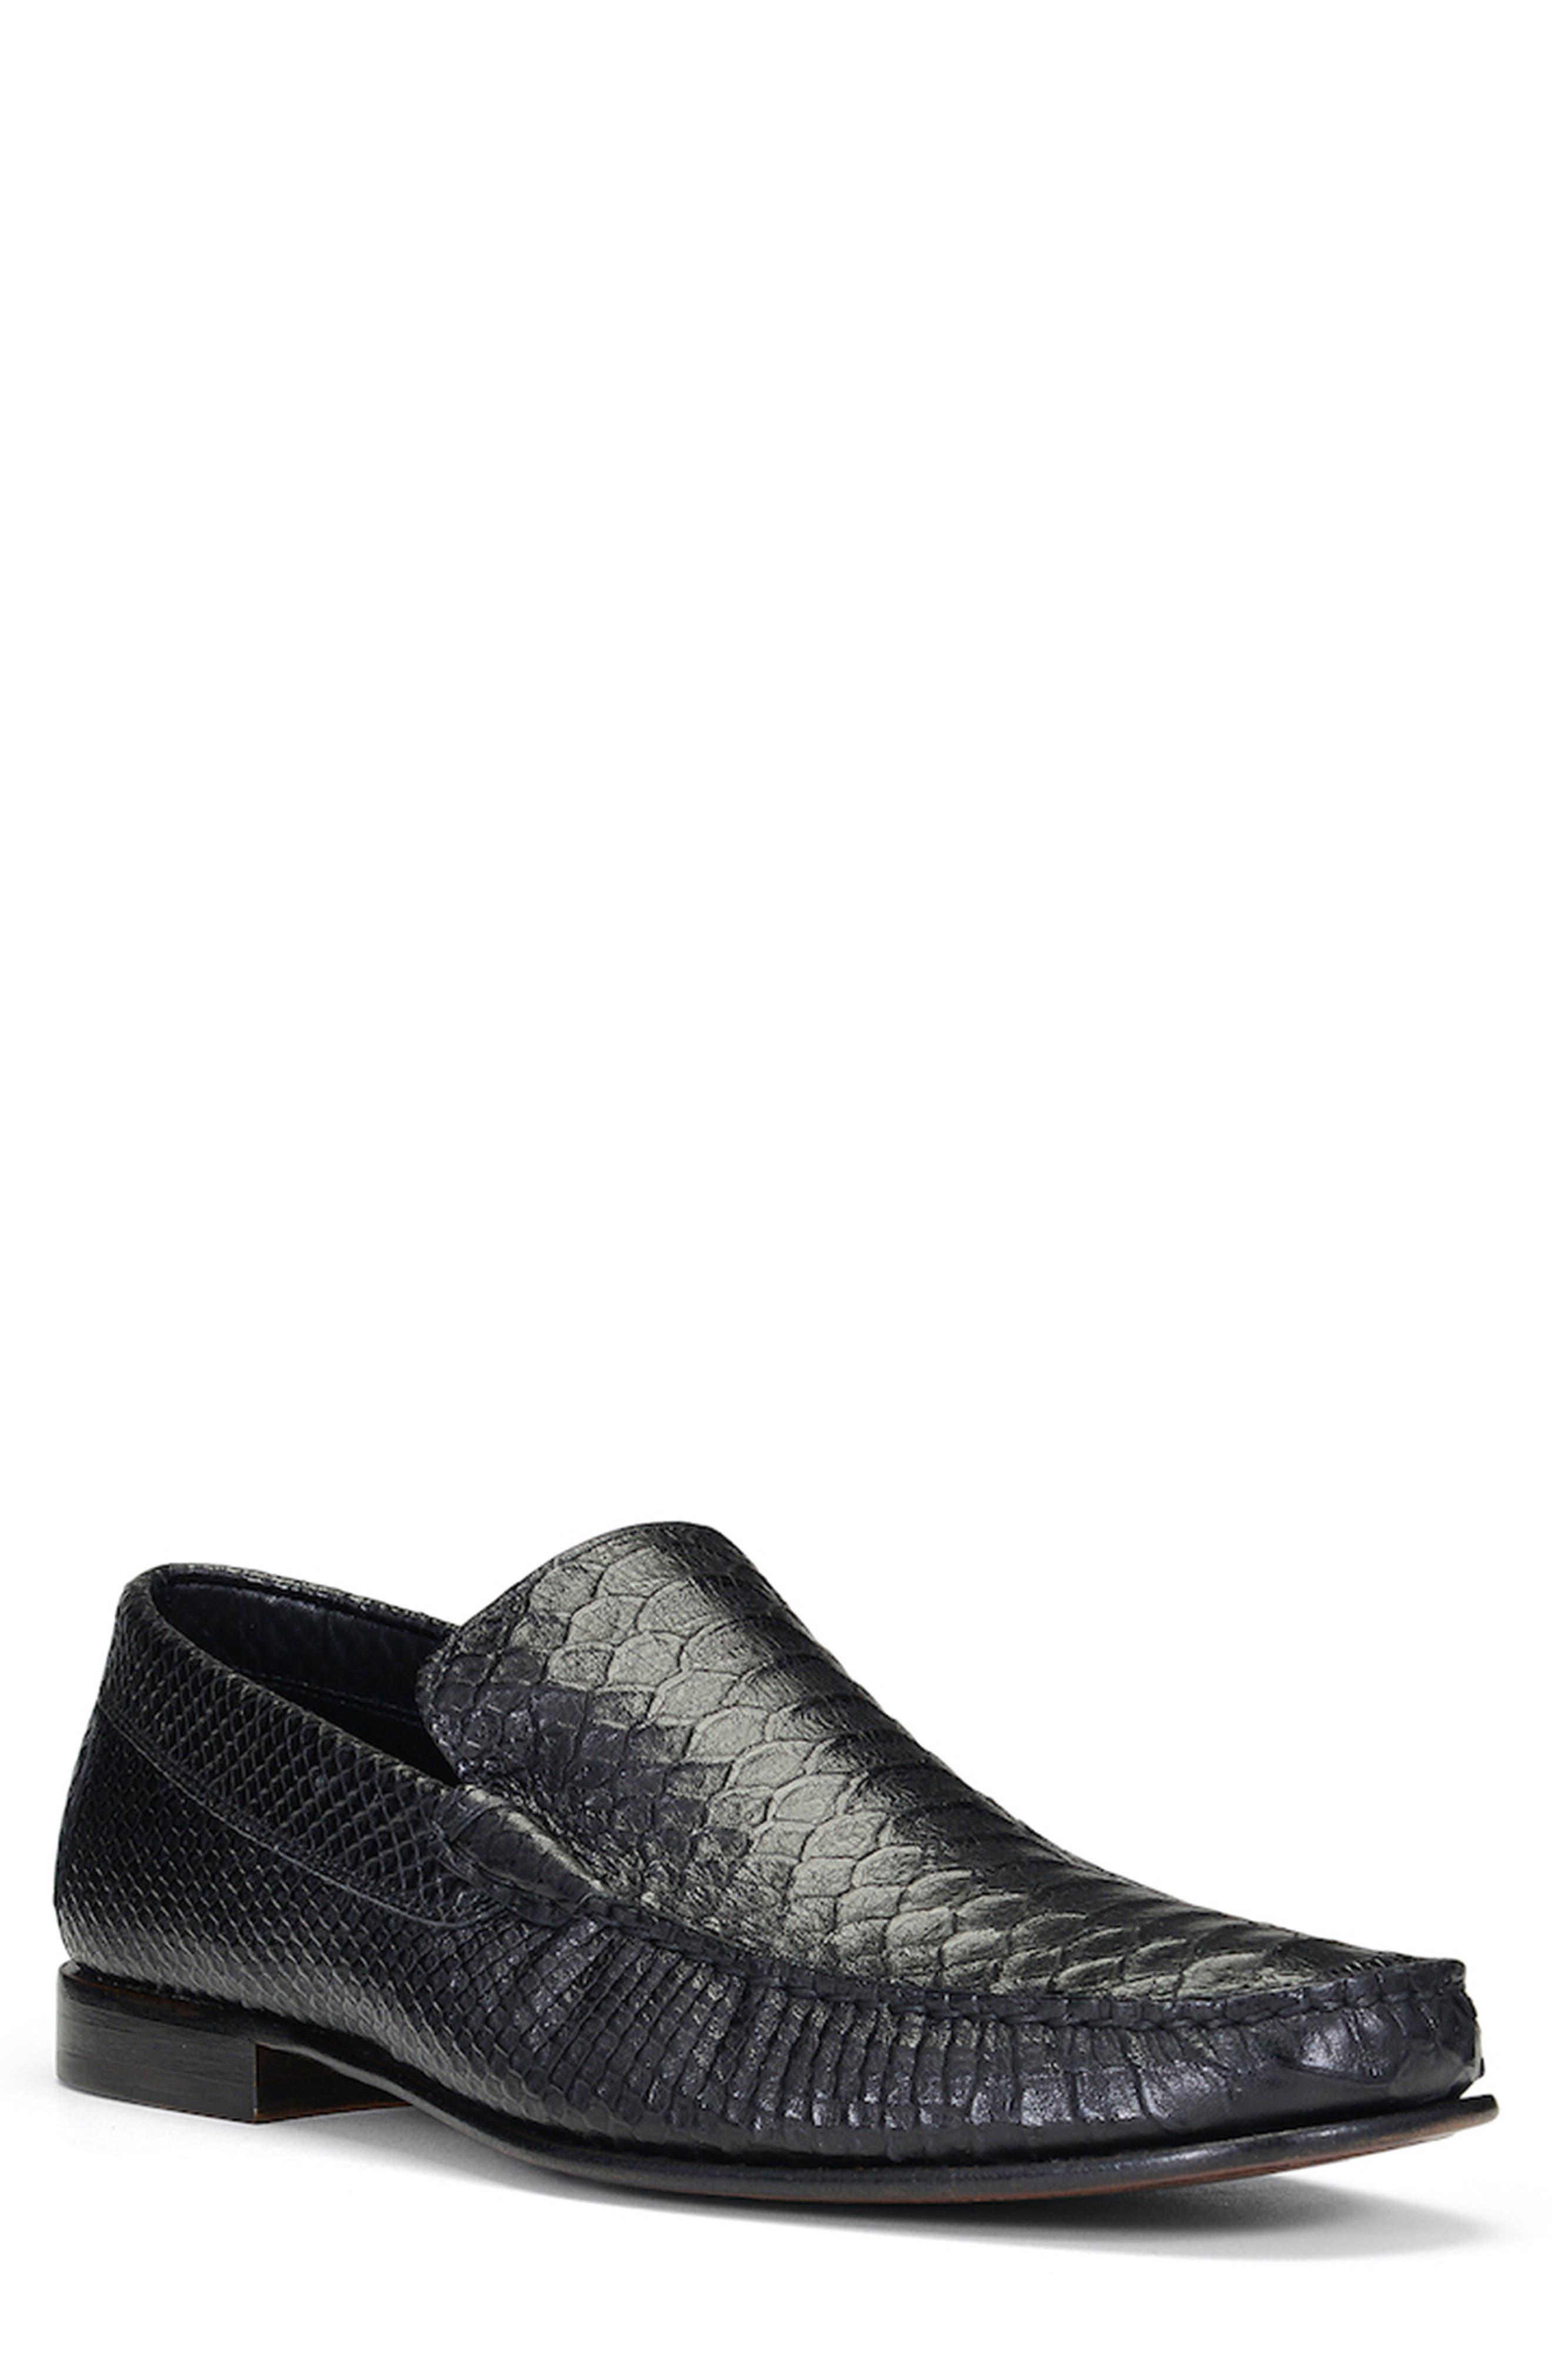 Dominick Venetian Loafer